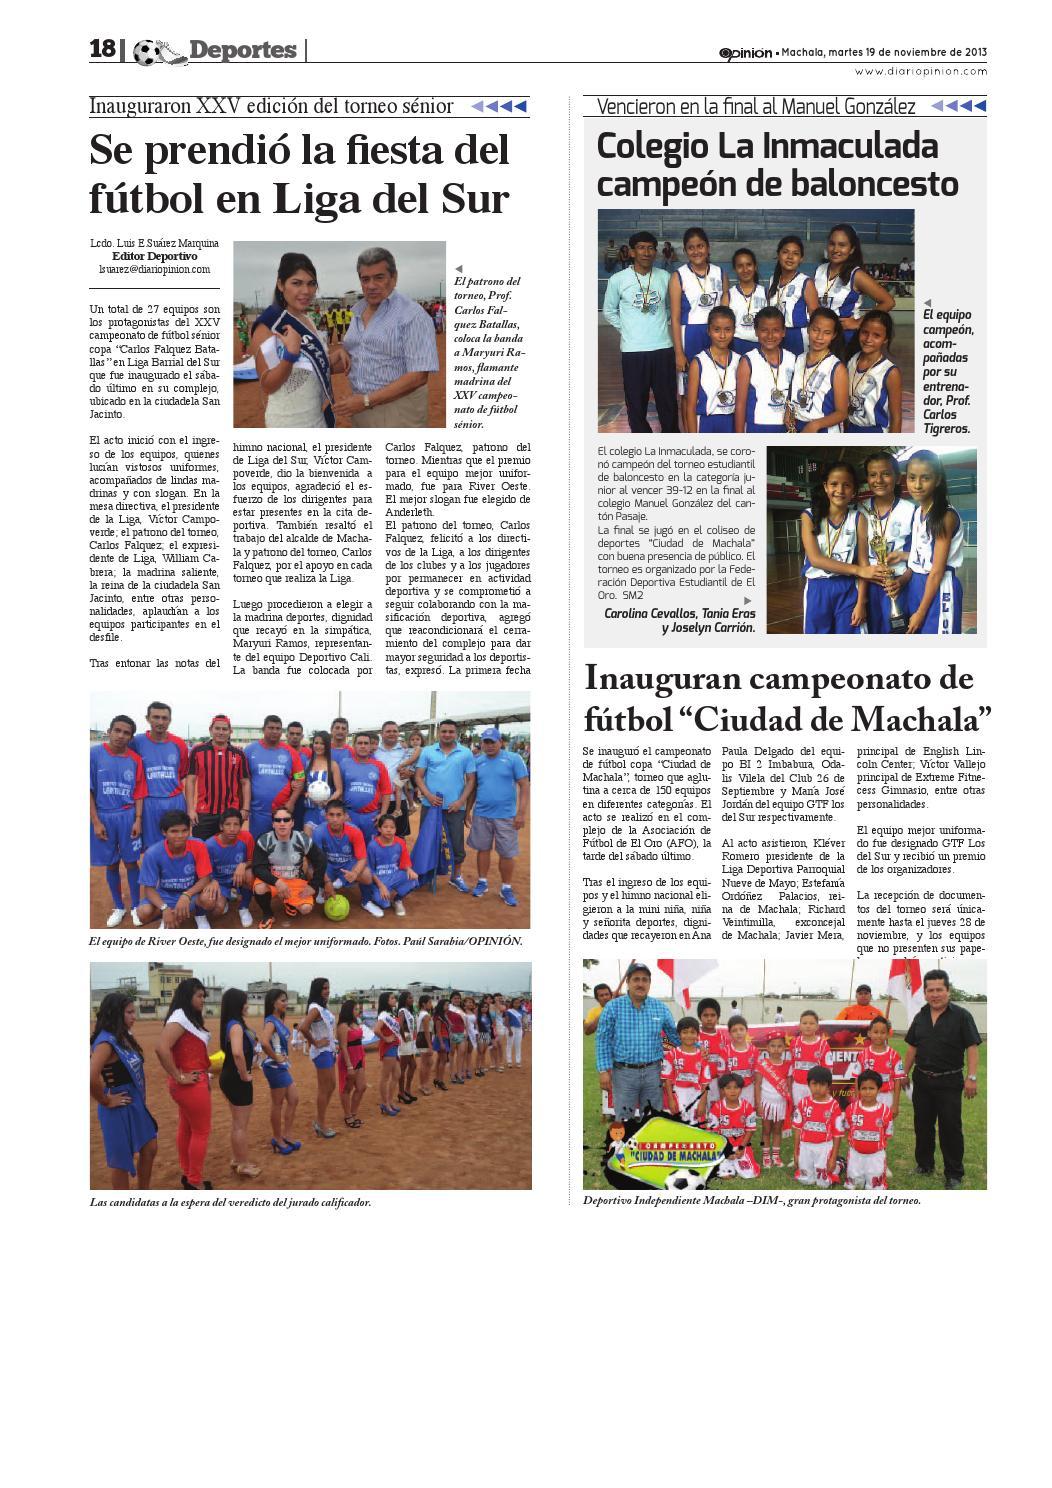 Impreso 19 11 13 By Diario Opinion Issuu